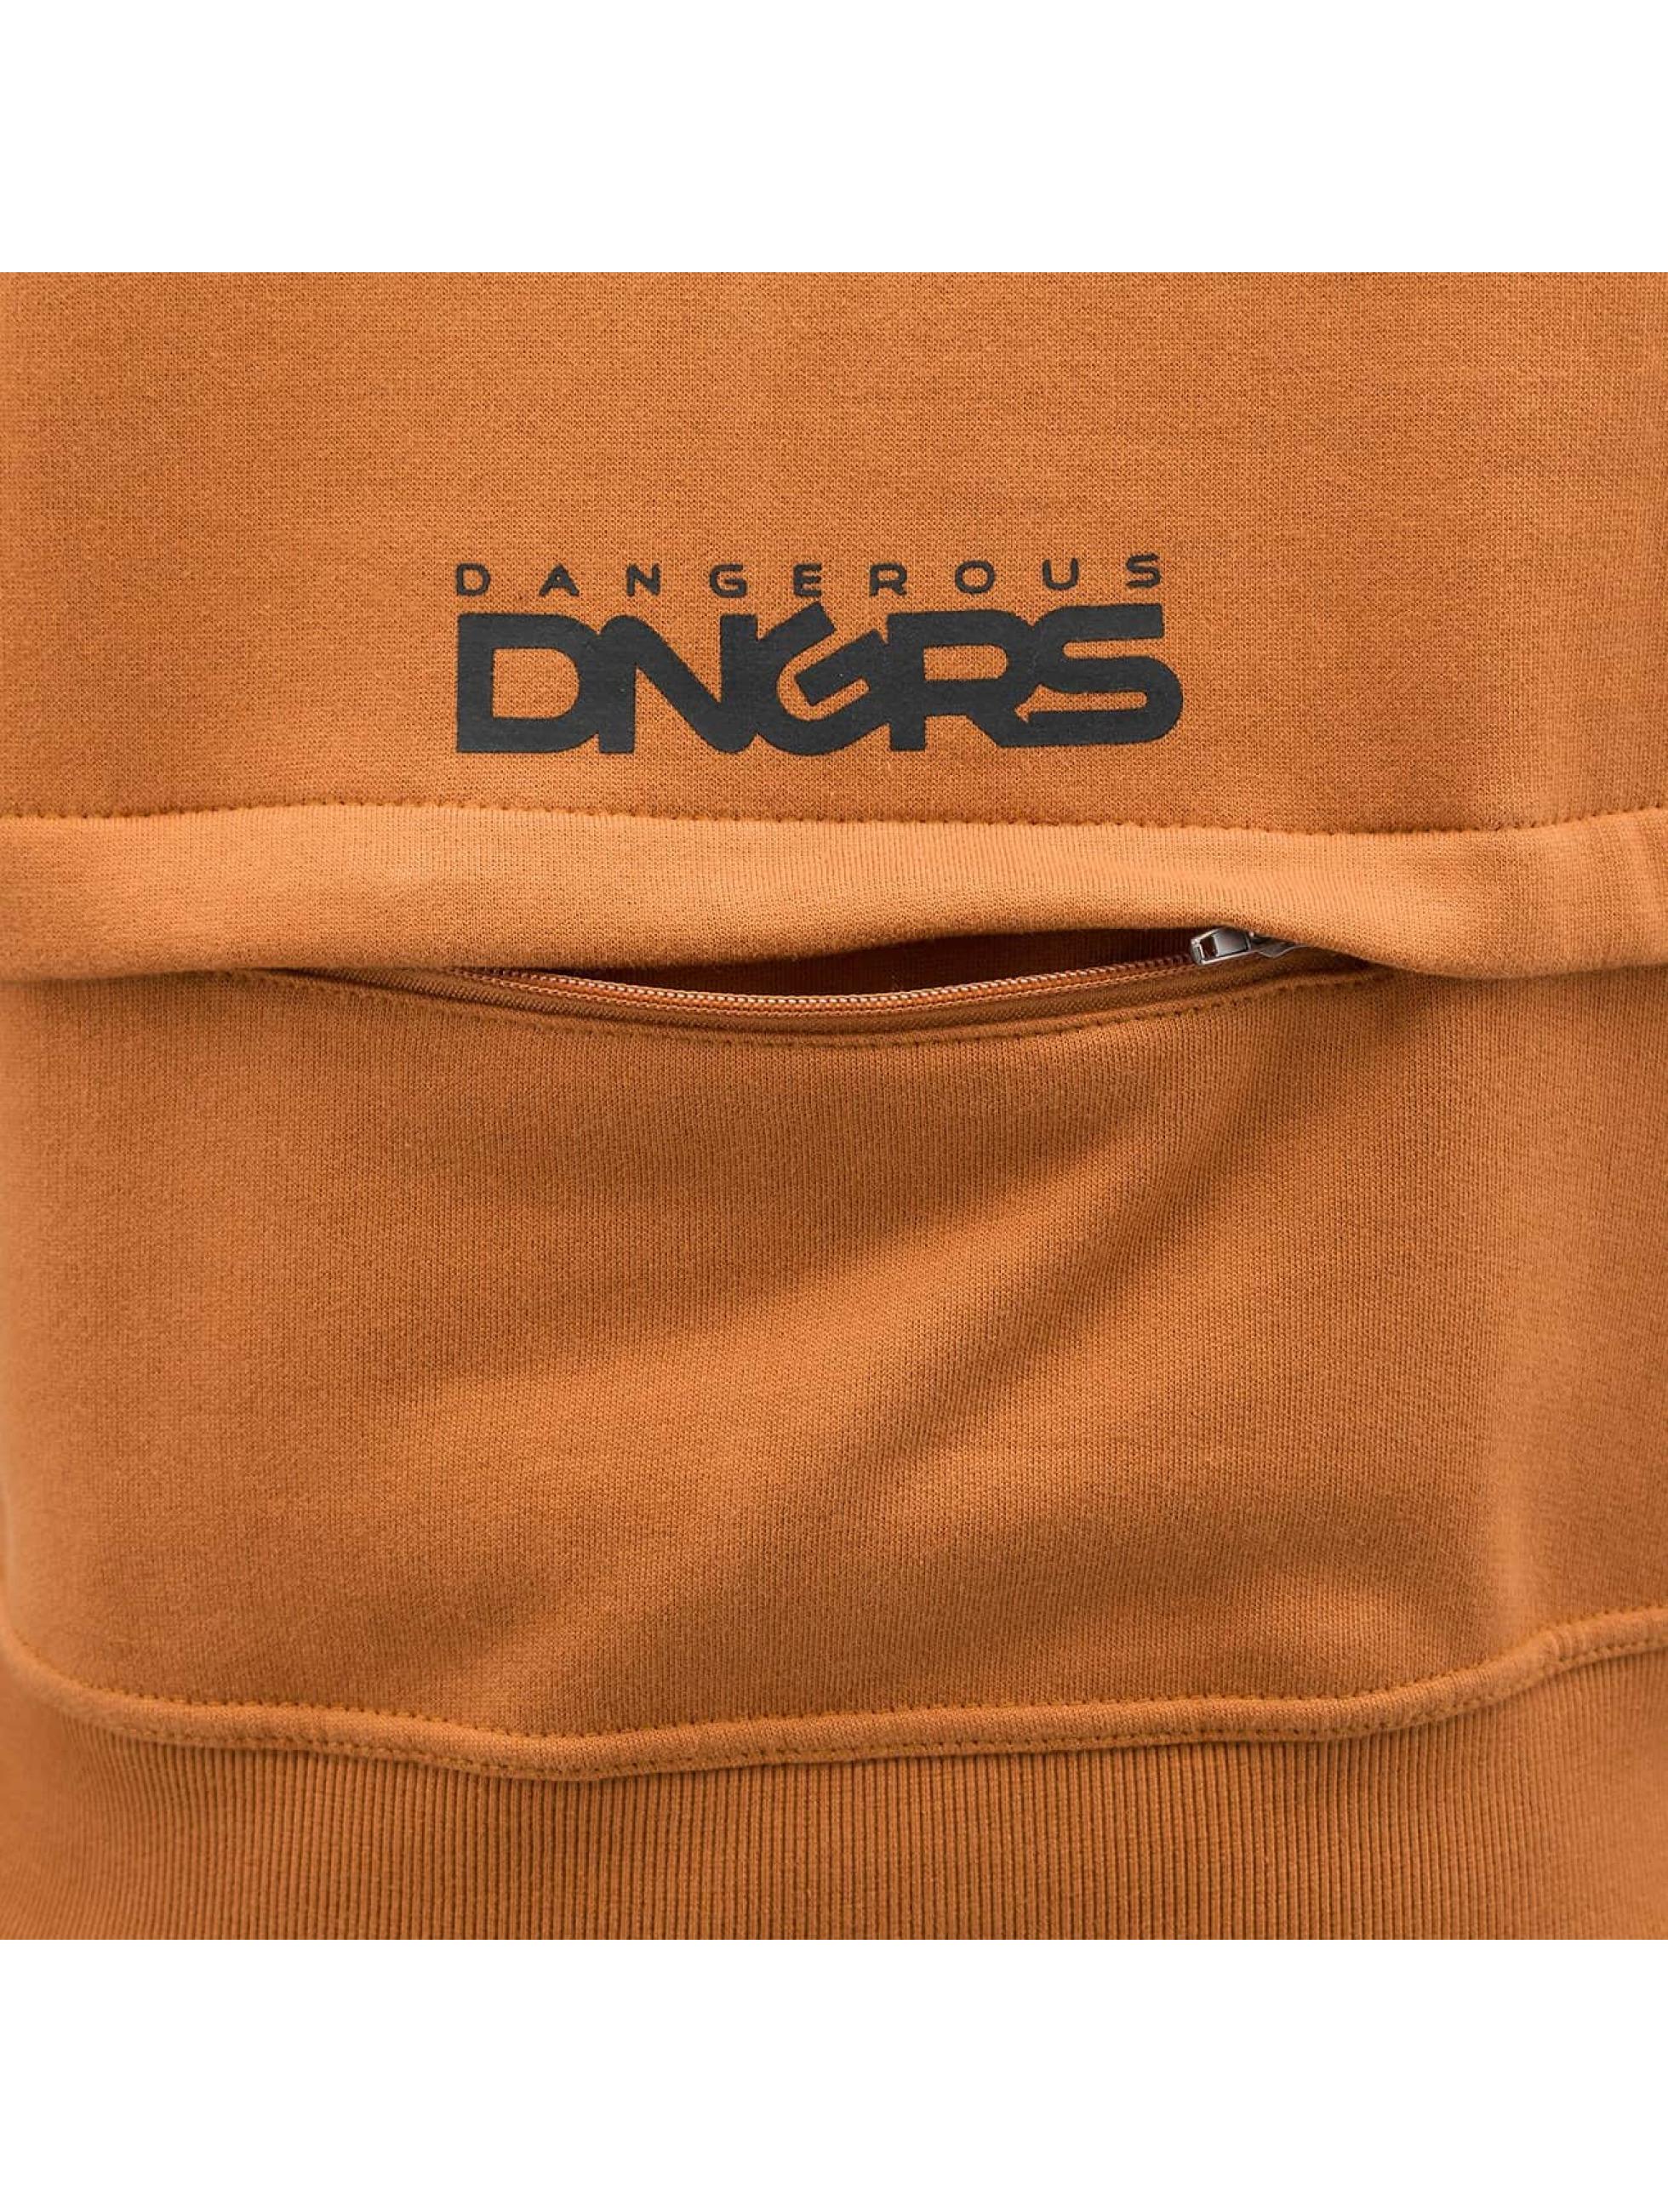 Dangerous DNGRS Zip Hoodie DGZH044 brown